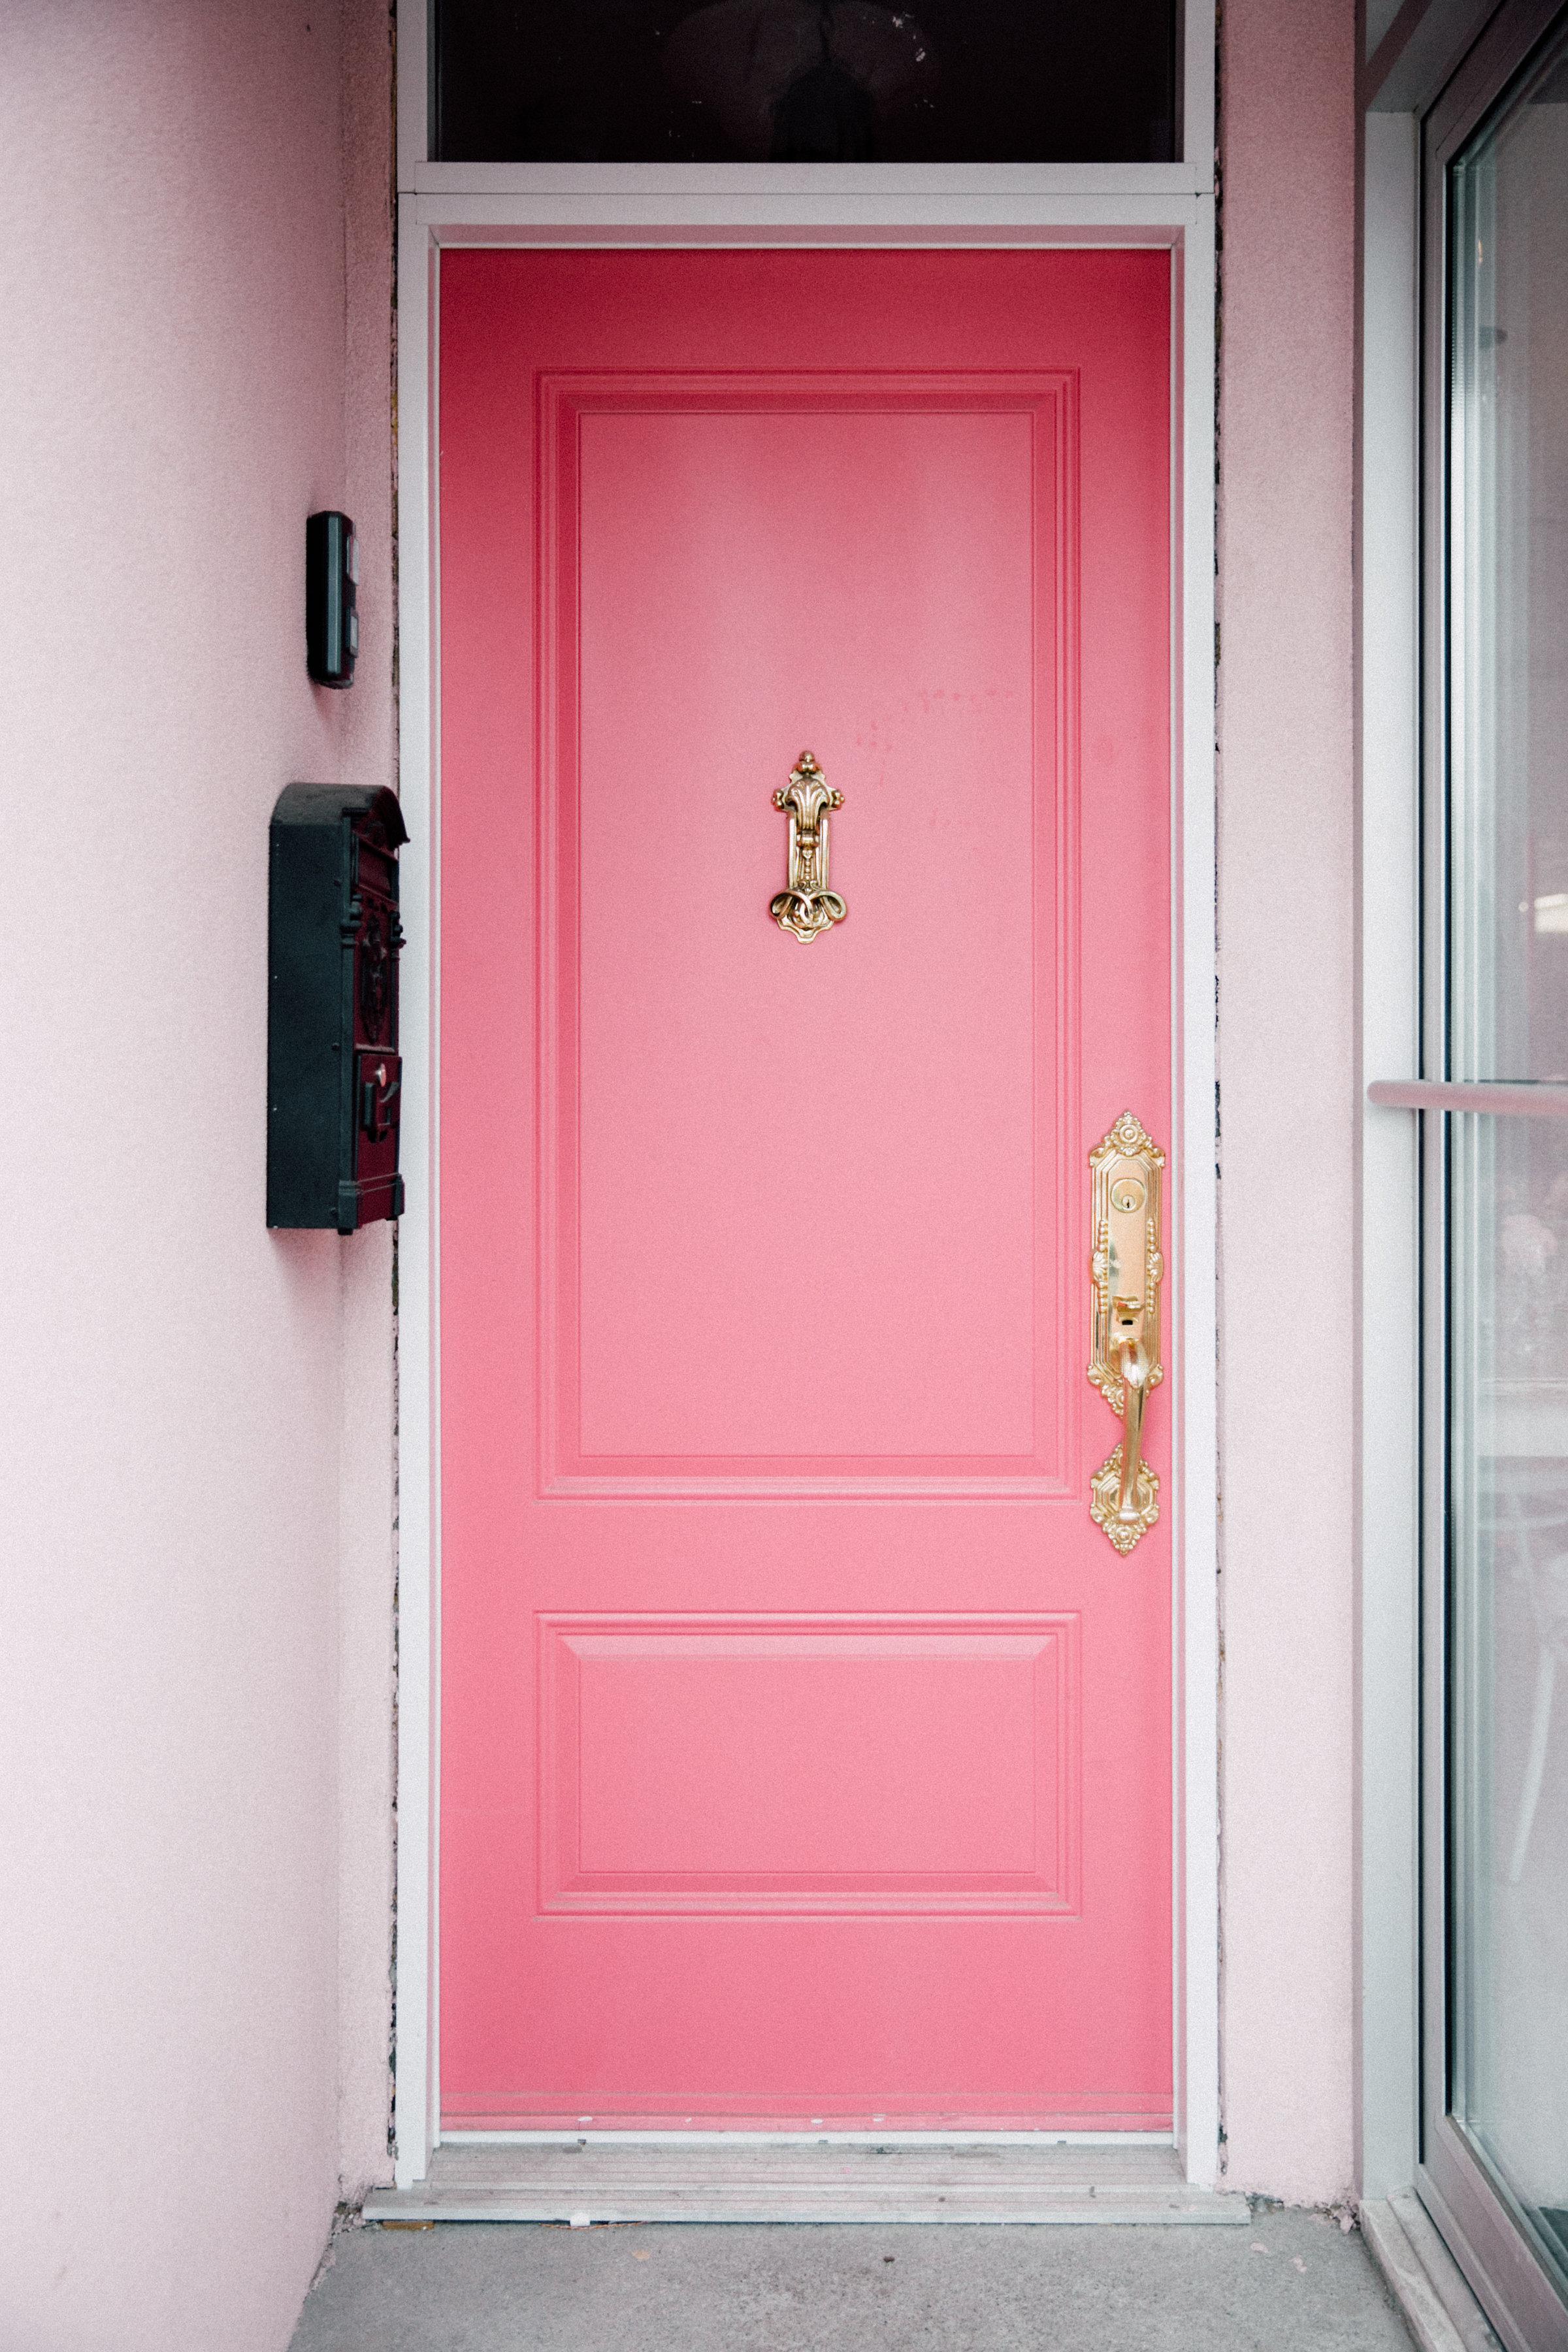 August In Bloom - Sweet Philosophy pink door - Bun In The Oven Baby Shower (Style Me Pretty & SMP Living)